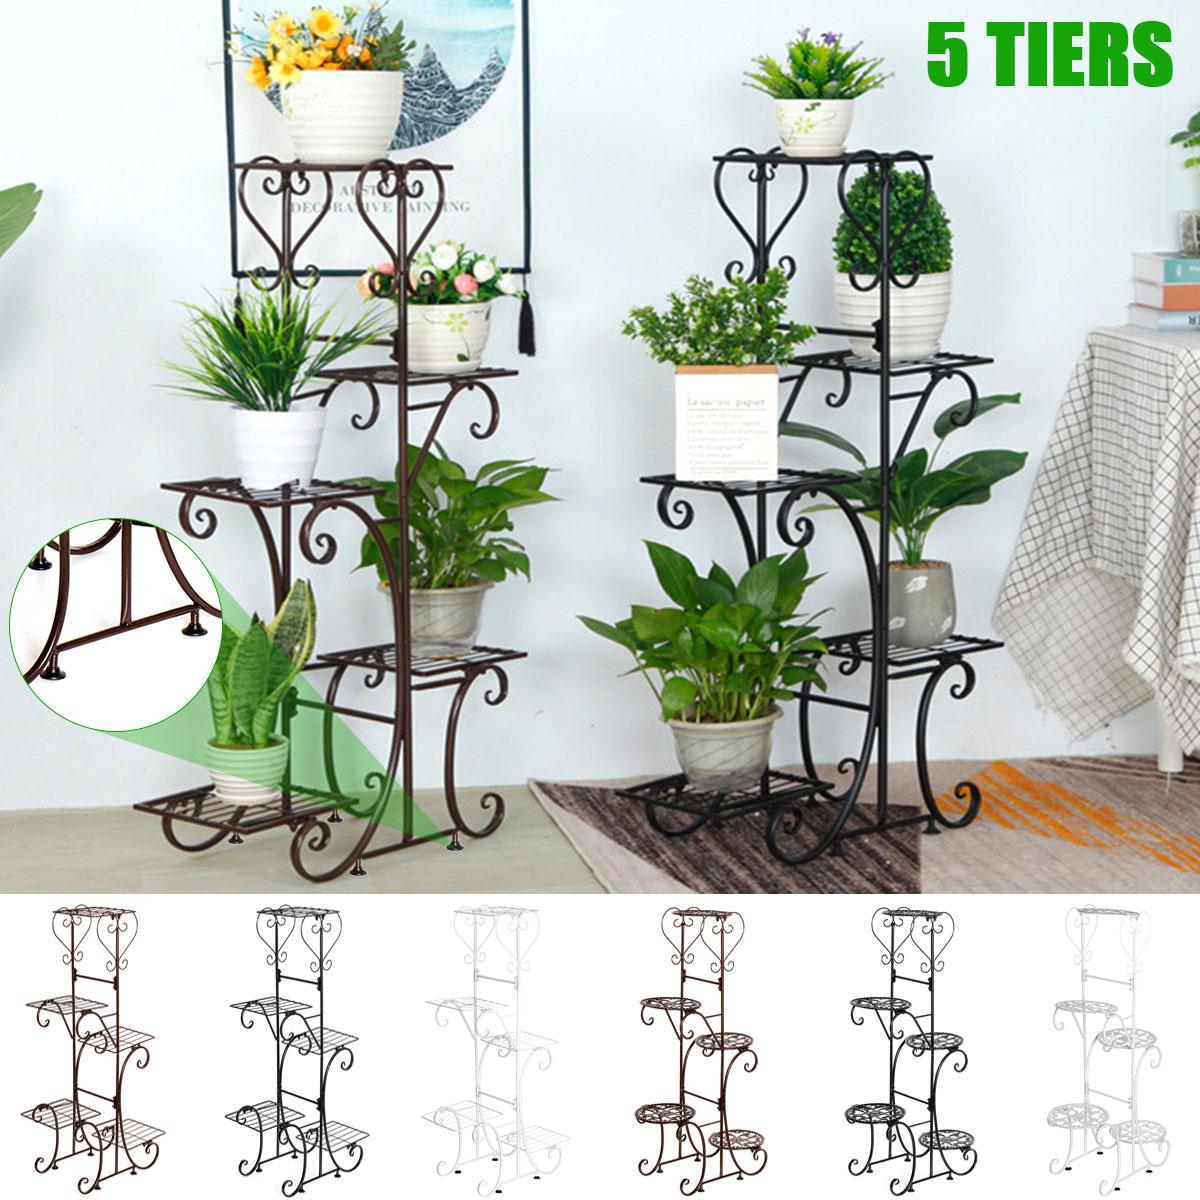 5 Tier Iron Plant Stand Rack Flower Pot Holder Garden Shelf Home Office Indoor Outdoor Plant Succulent Shelf Patio Garden Decor